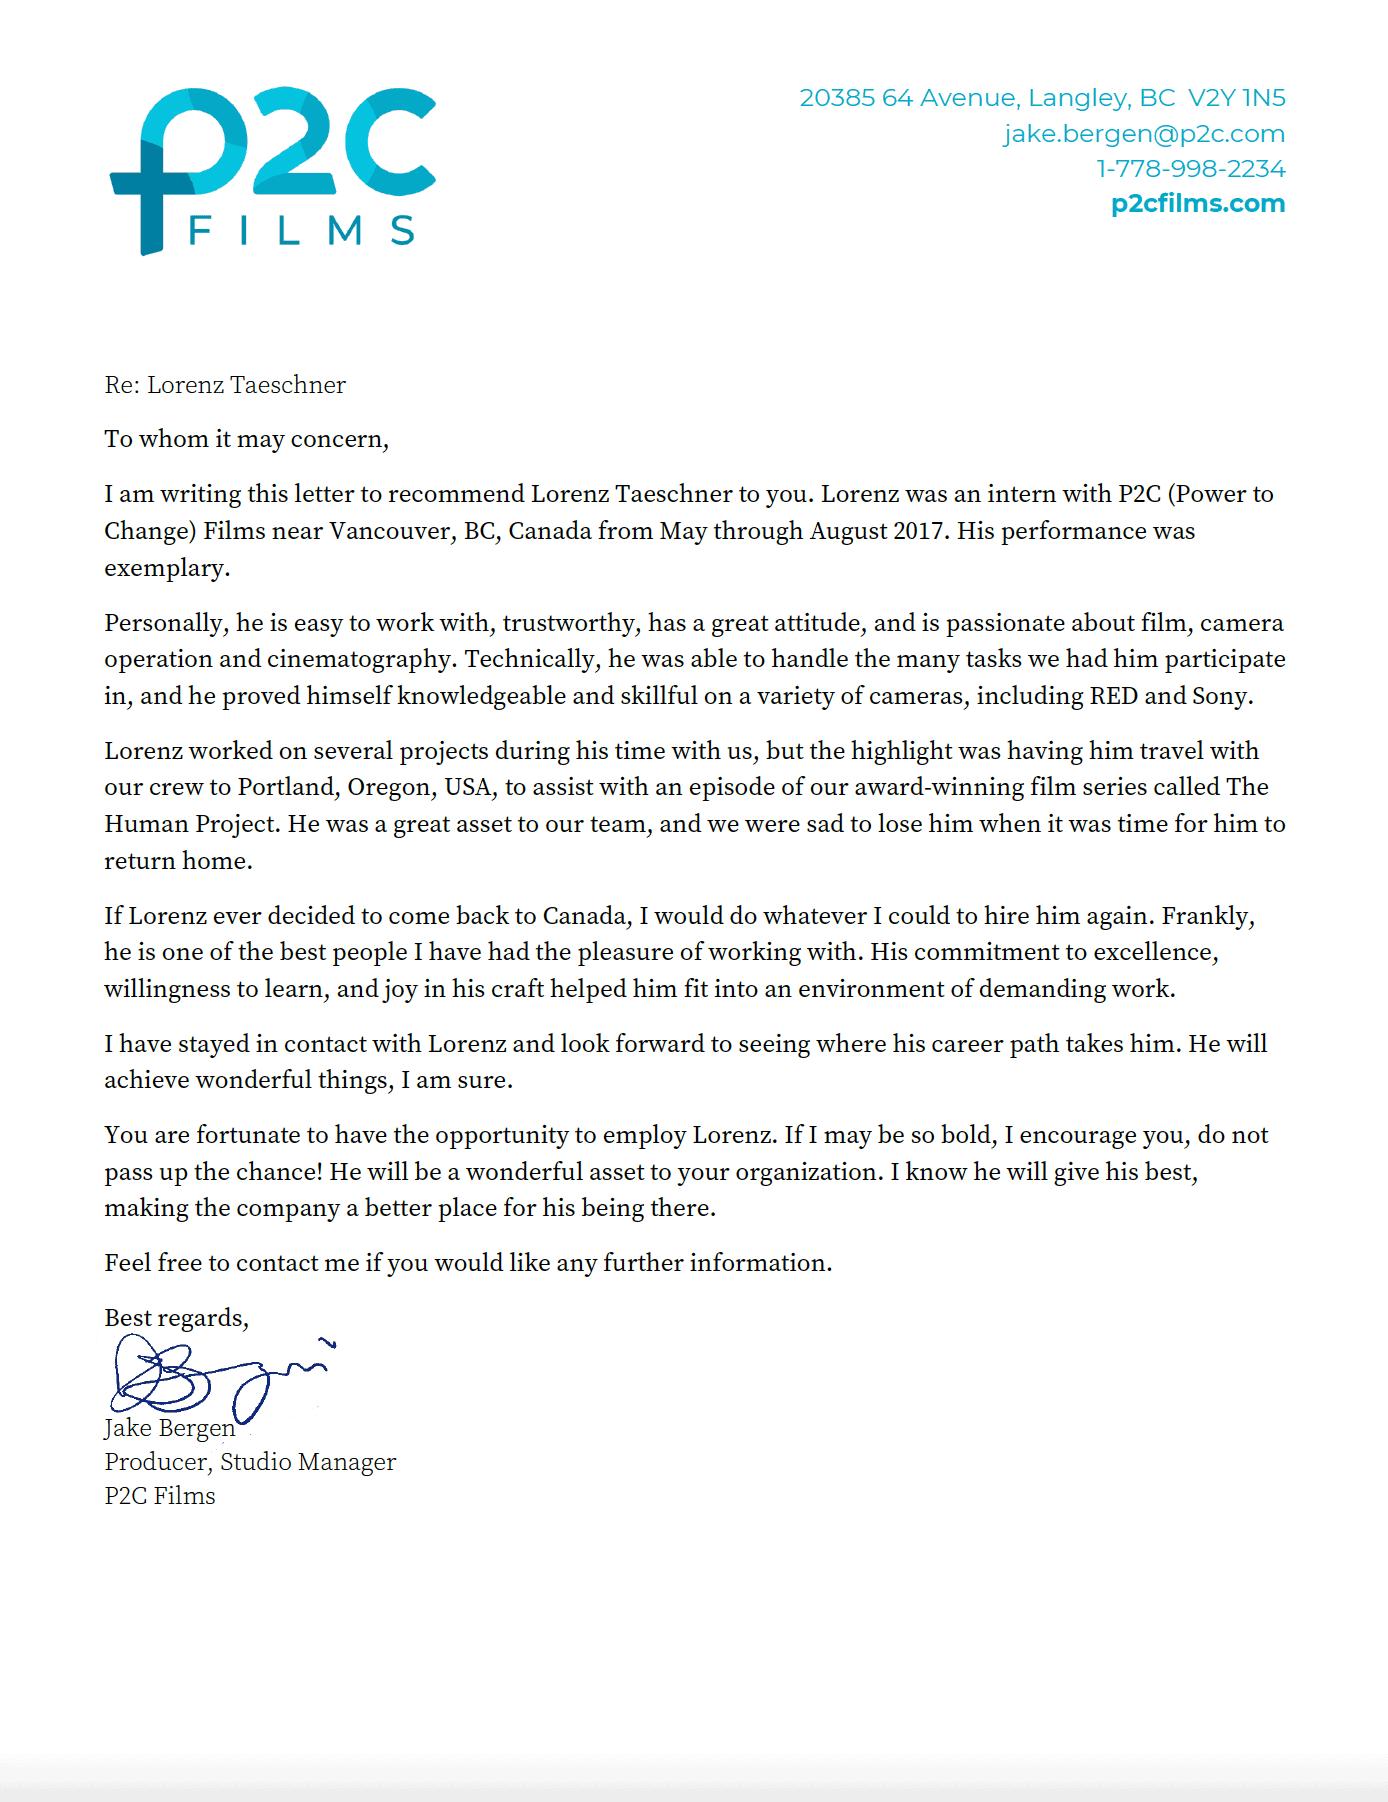 P2C-Films-Letter-of-Recommendation-Lorenz-Taeschner